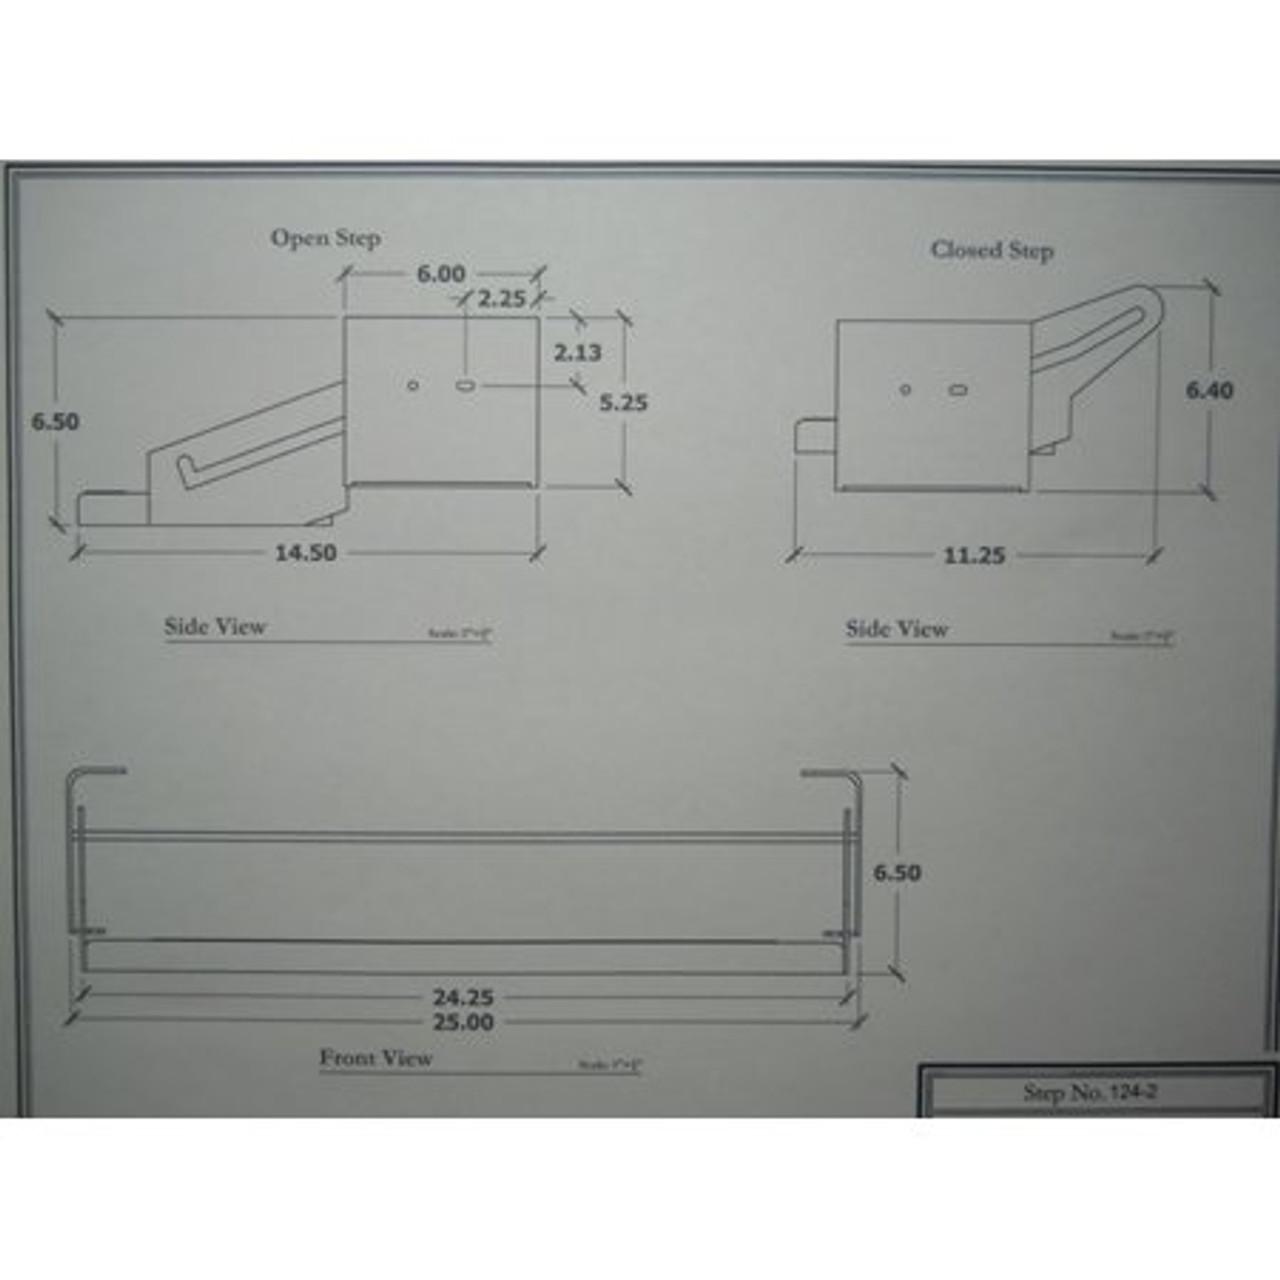 "24"" SINGLE TRAILER STEP - 5"" DROP - (04-1002) DIMENSIONS 2"